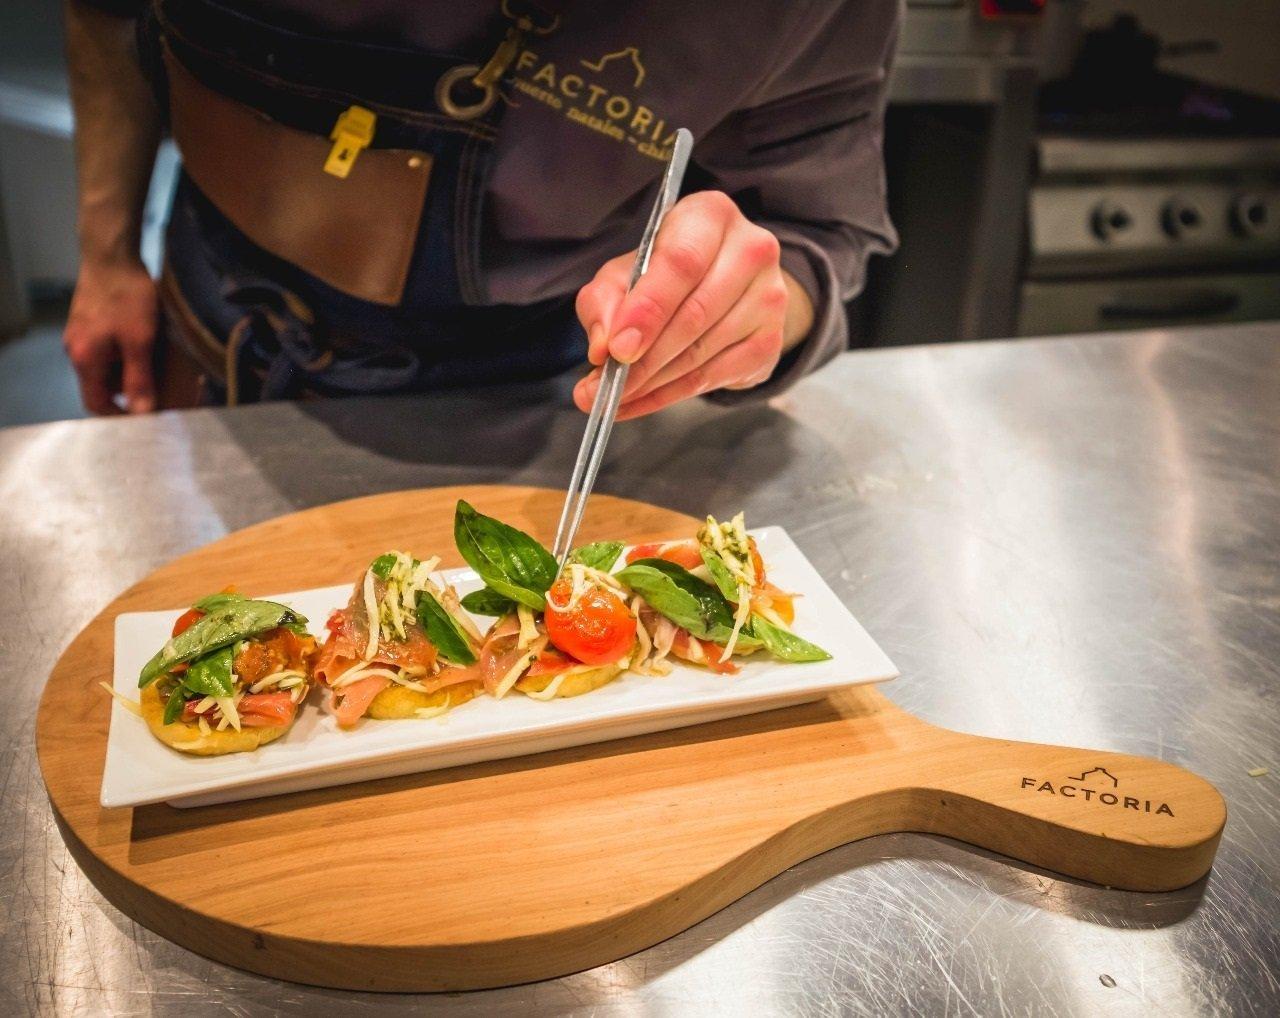 Restaurant montaje brusquetas